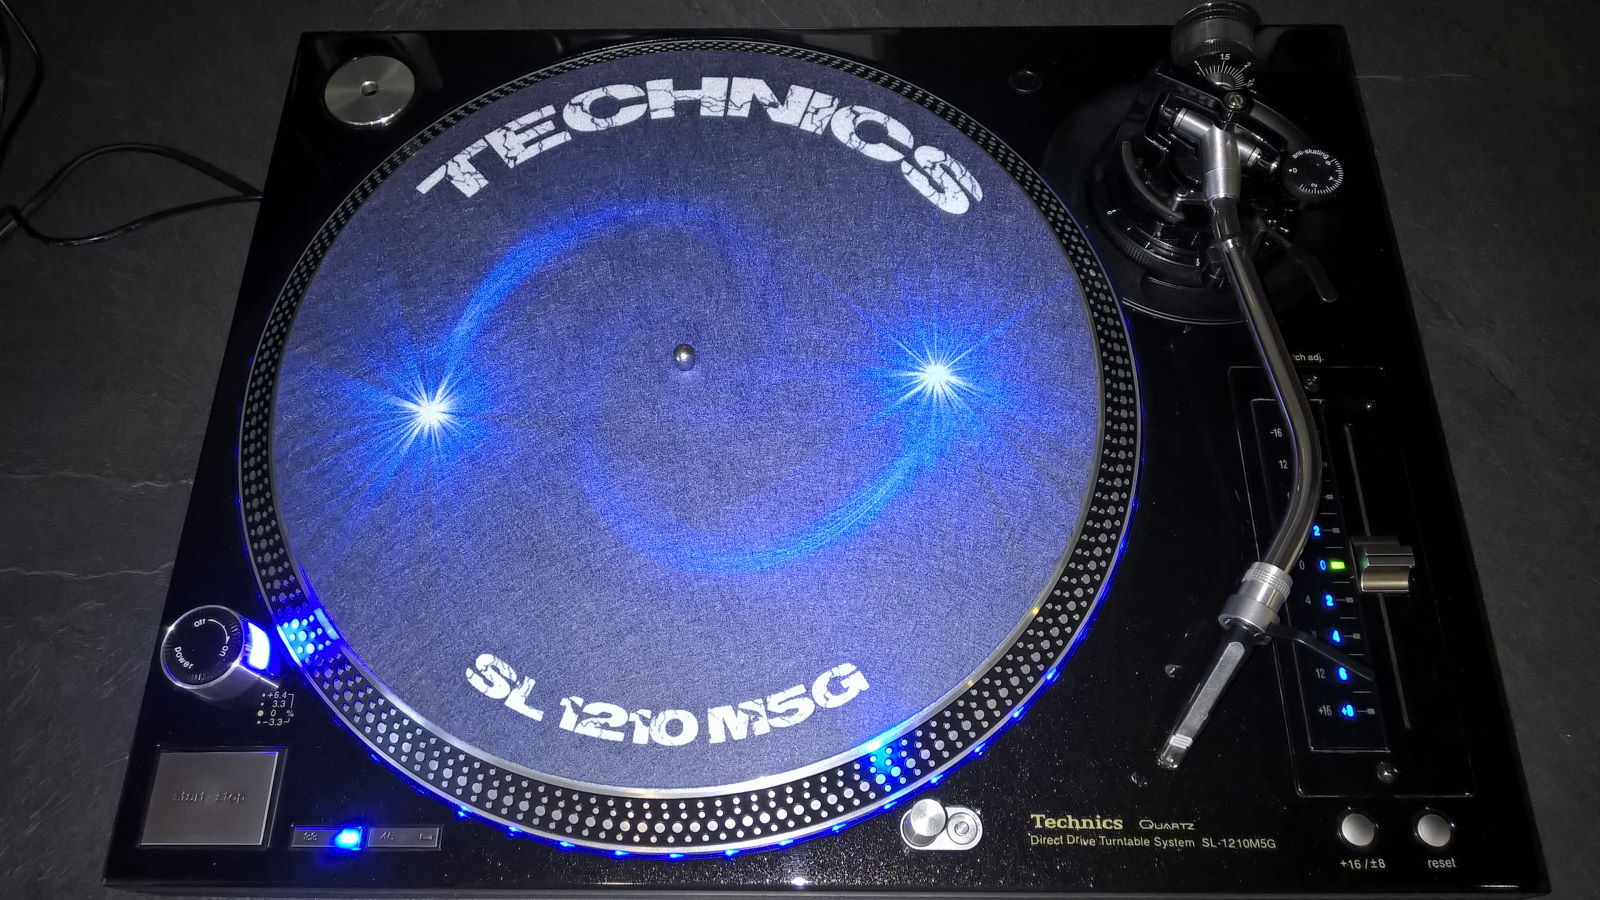 technics sl 1200 mk2 image 1434163 audiofanzine. Black Bedroom Furniture Sets. Home Design Ideas